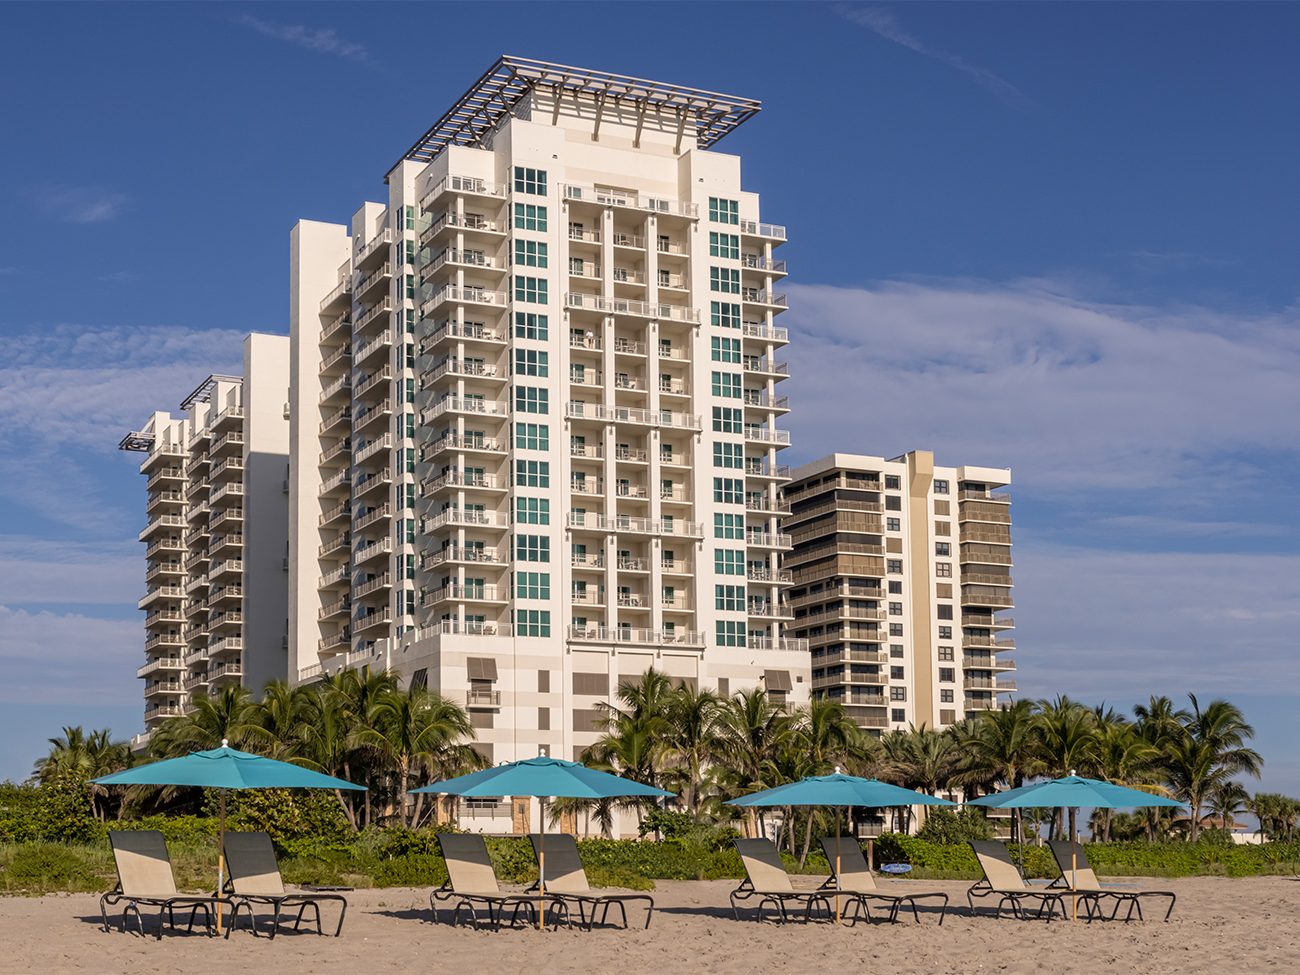 Marriott's Oceana Palms Exterior. Marriott's Oceana Palms is located in Riviera Beach, Florida United States.